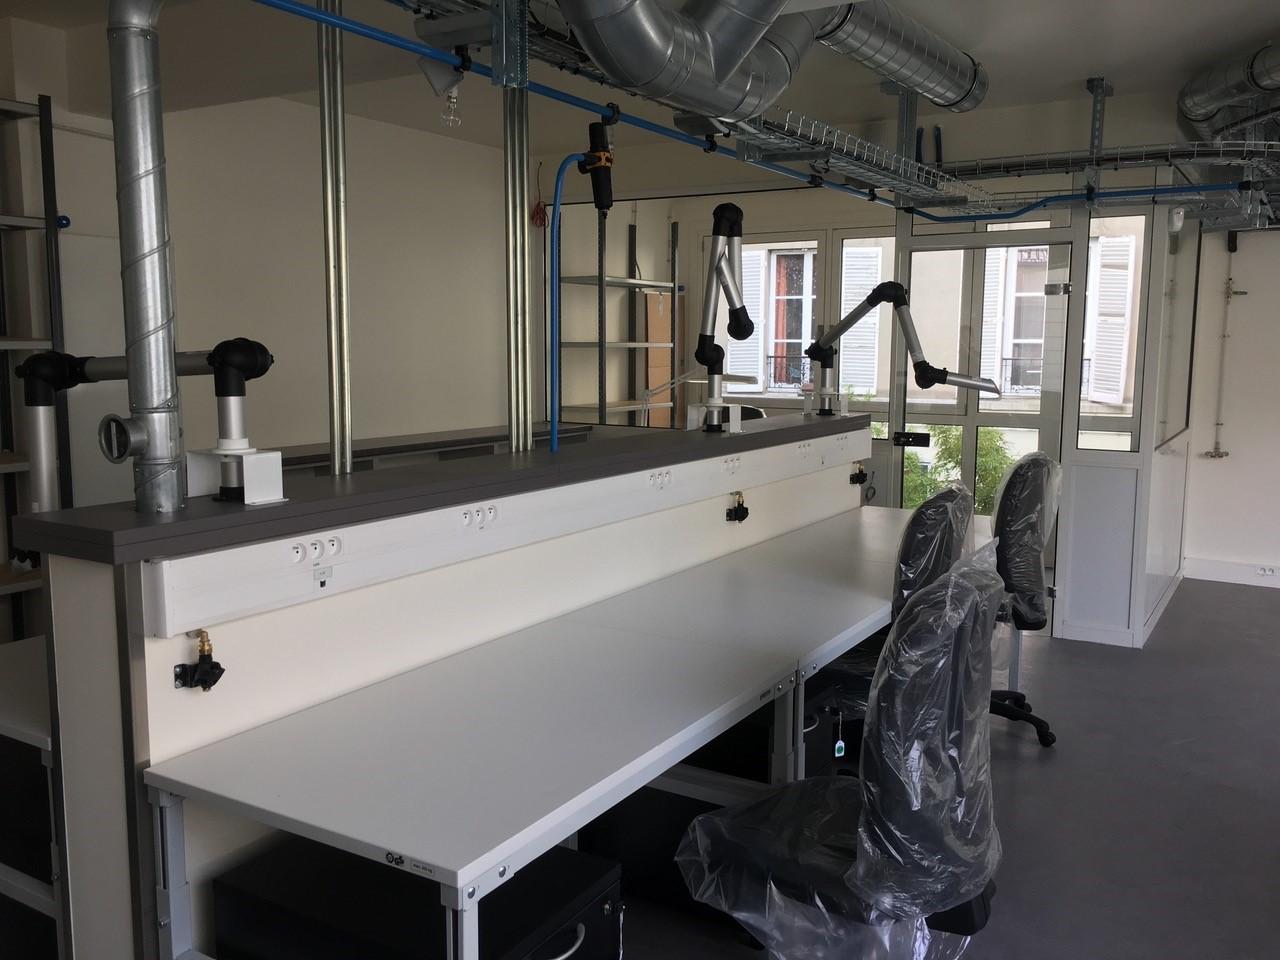 r seau d 39 air comprim atelier4 tuyauterie industrielle en aluminium et inox. Black Bedroom Furniture Sets. Home Design Ideas